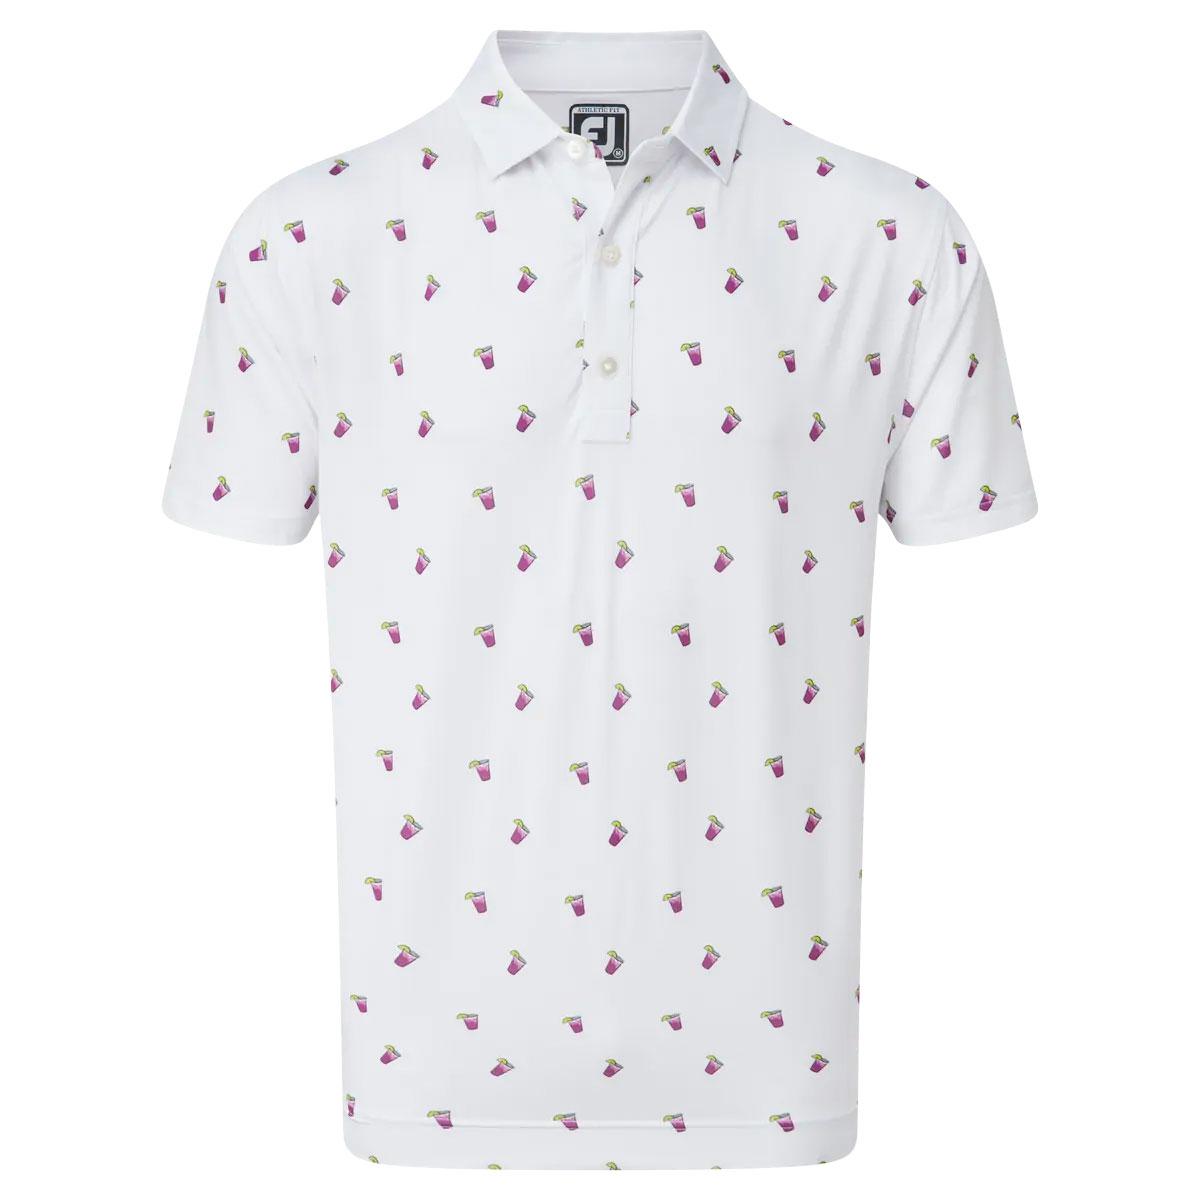 FootJoy Lisle Cocktail Print Mens Golf Polo Shirt  - White